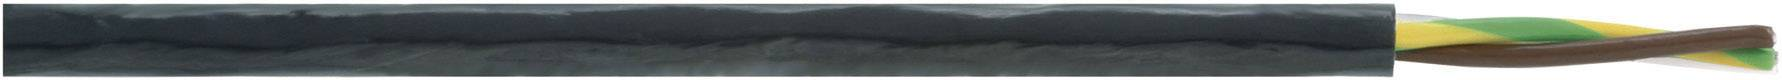 Vysokoteplotný kábel LappKabel ÖLFLEX® HEAT 260 MC 0091305, 2 x 0.75 mm², čierna, metrový tovar